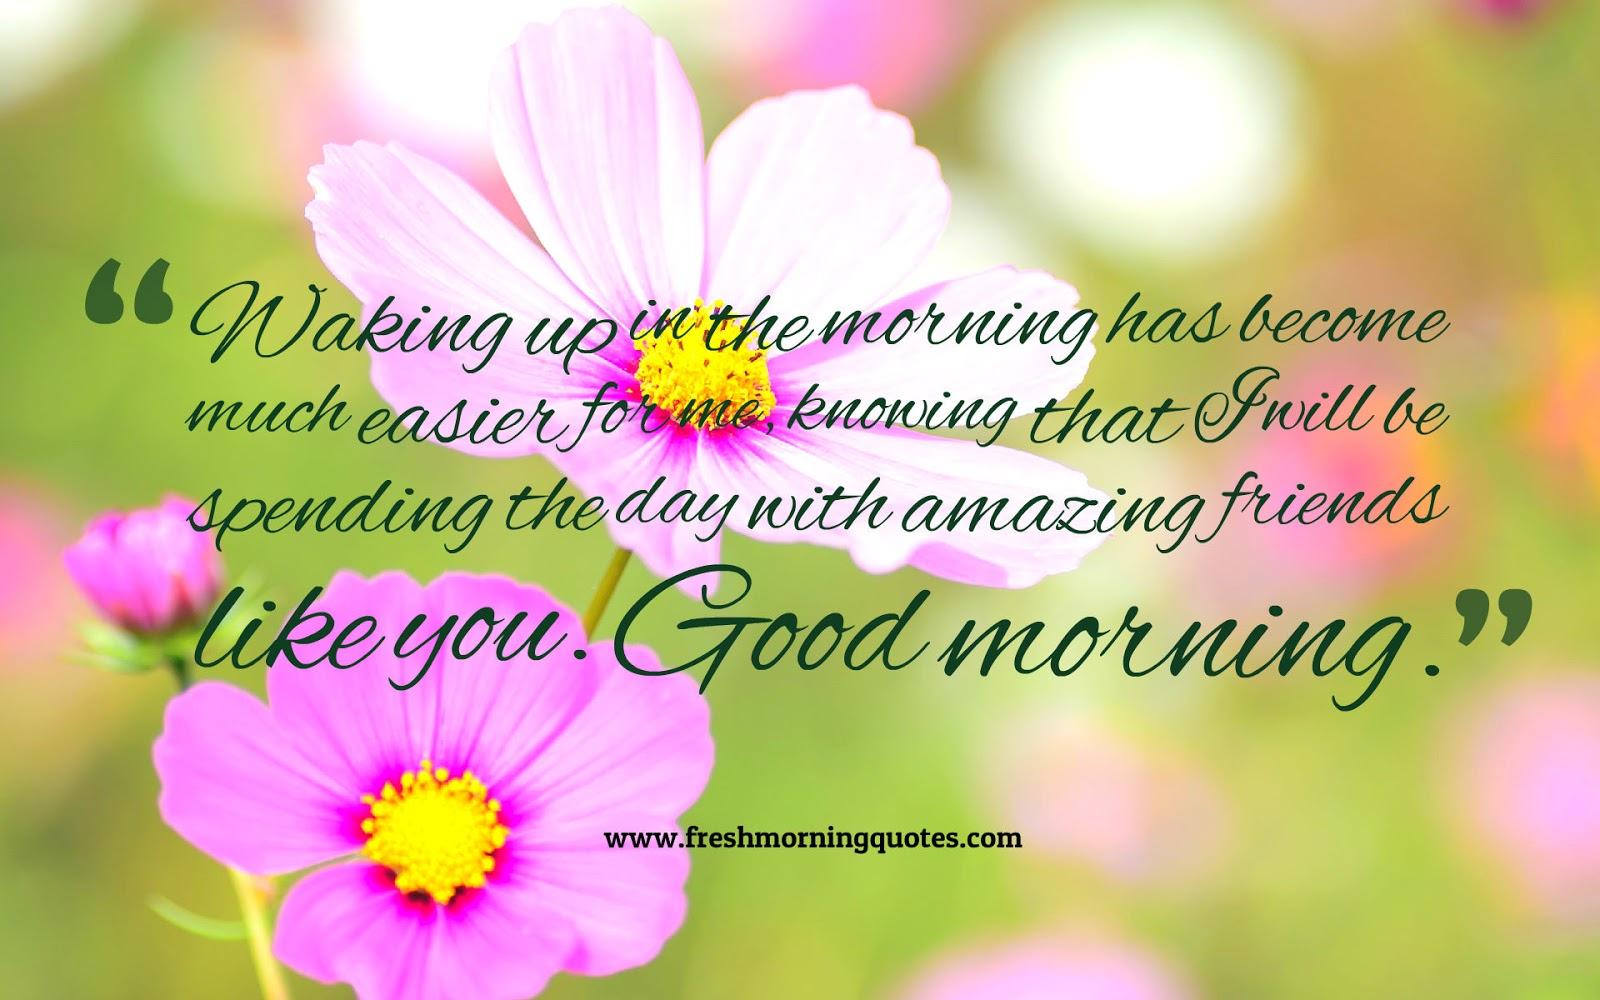 60 Beautiful Good Morning Whatsapp Status Messages